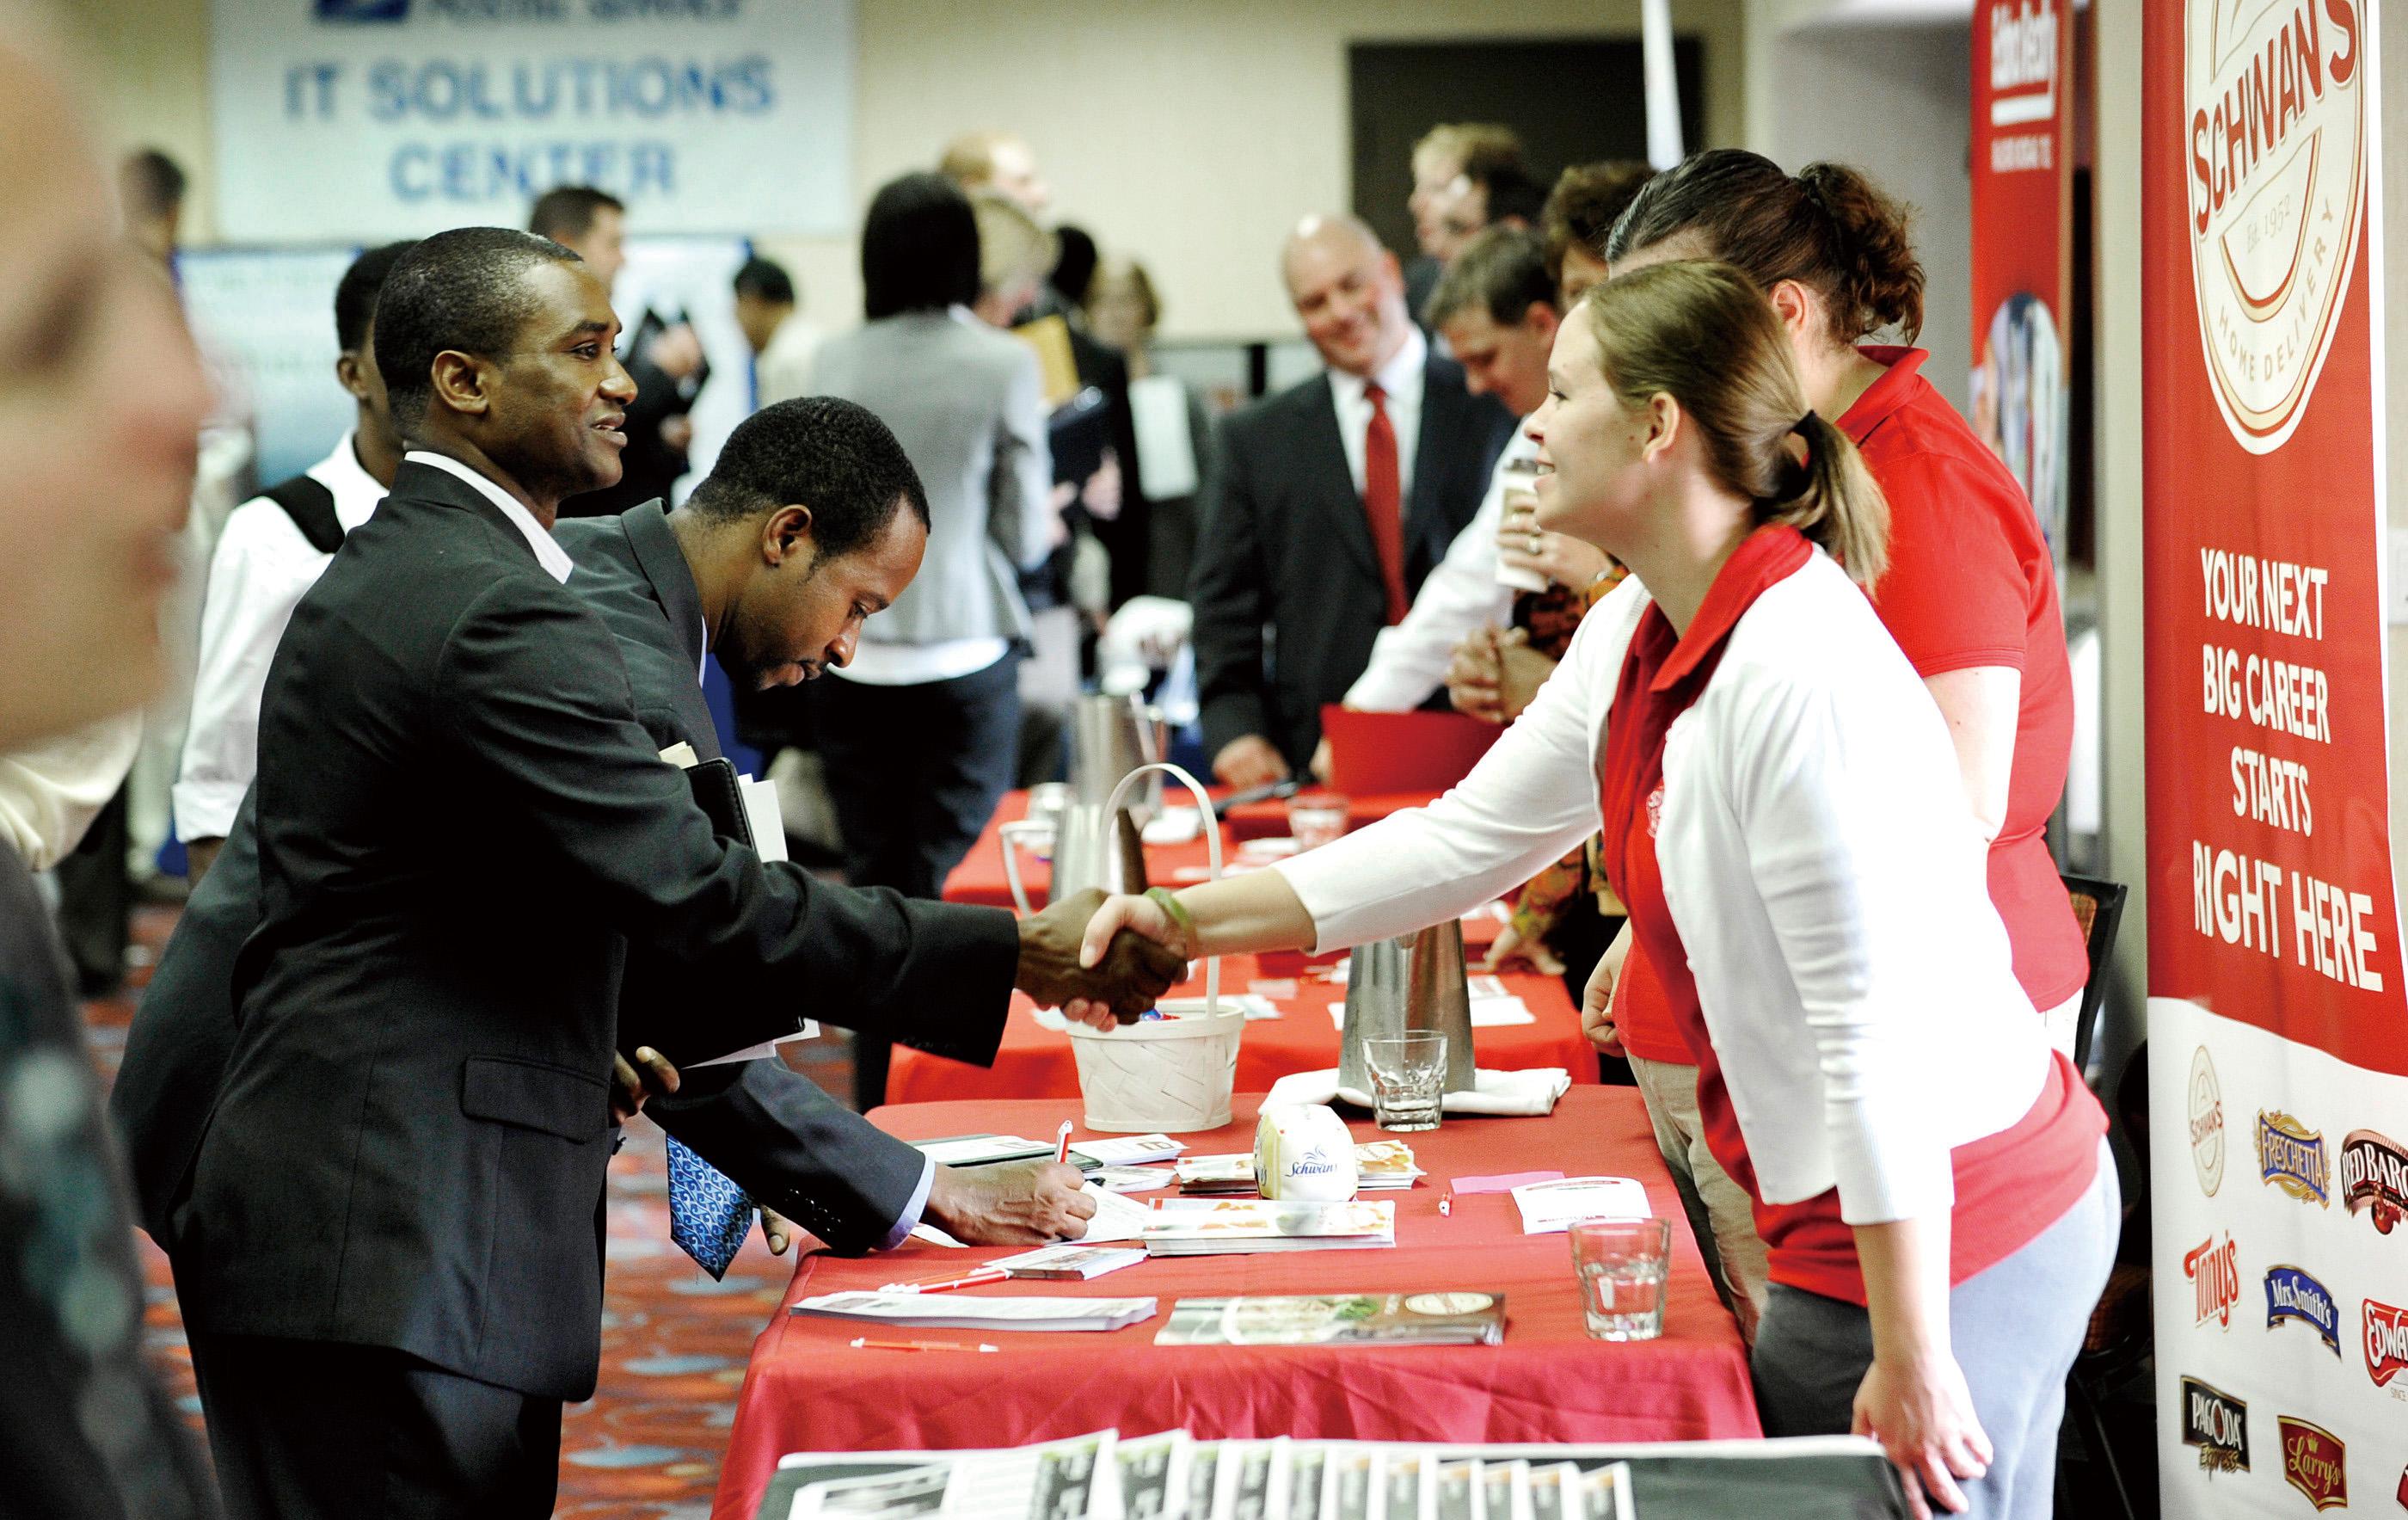 Job seekers visit the Minneapolis Career Fair held Wednesday, Nov. 2, 2011, in Bloomington, Minn. Fewer people applied for unemployment benefits last ...